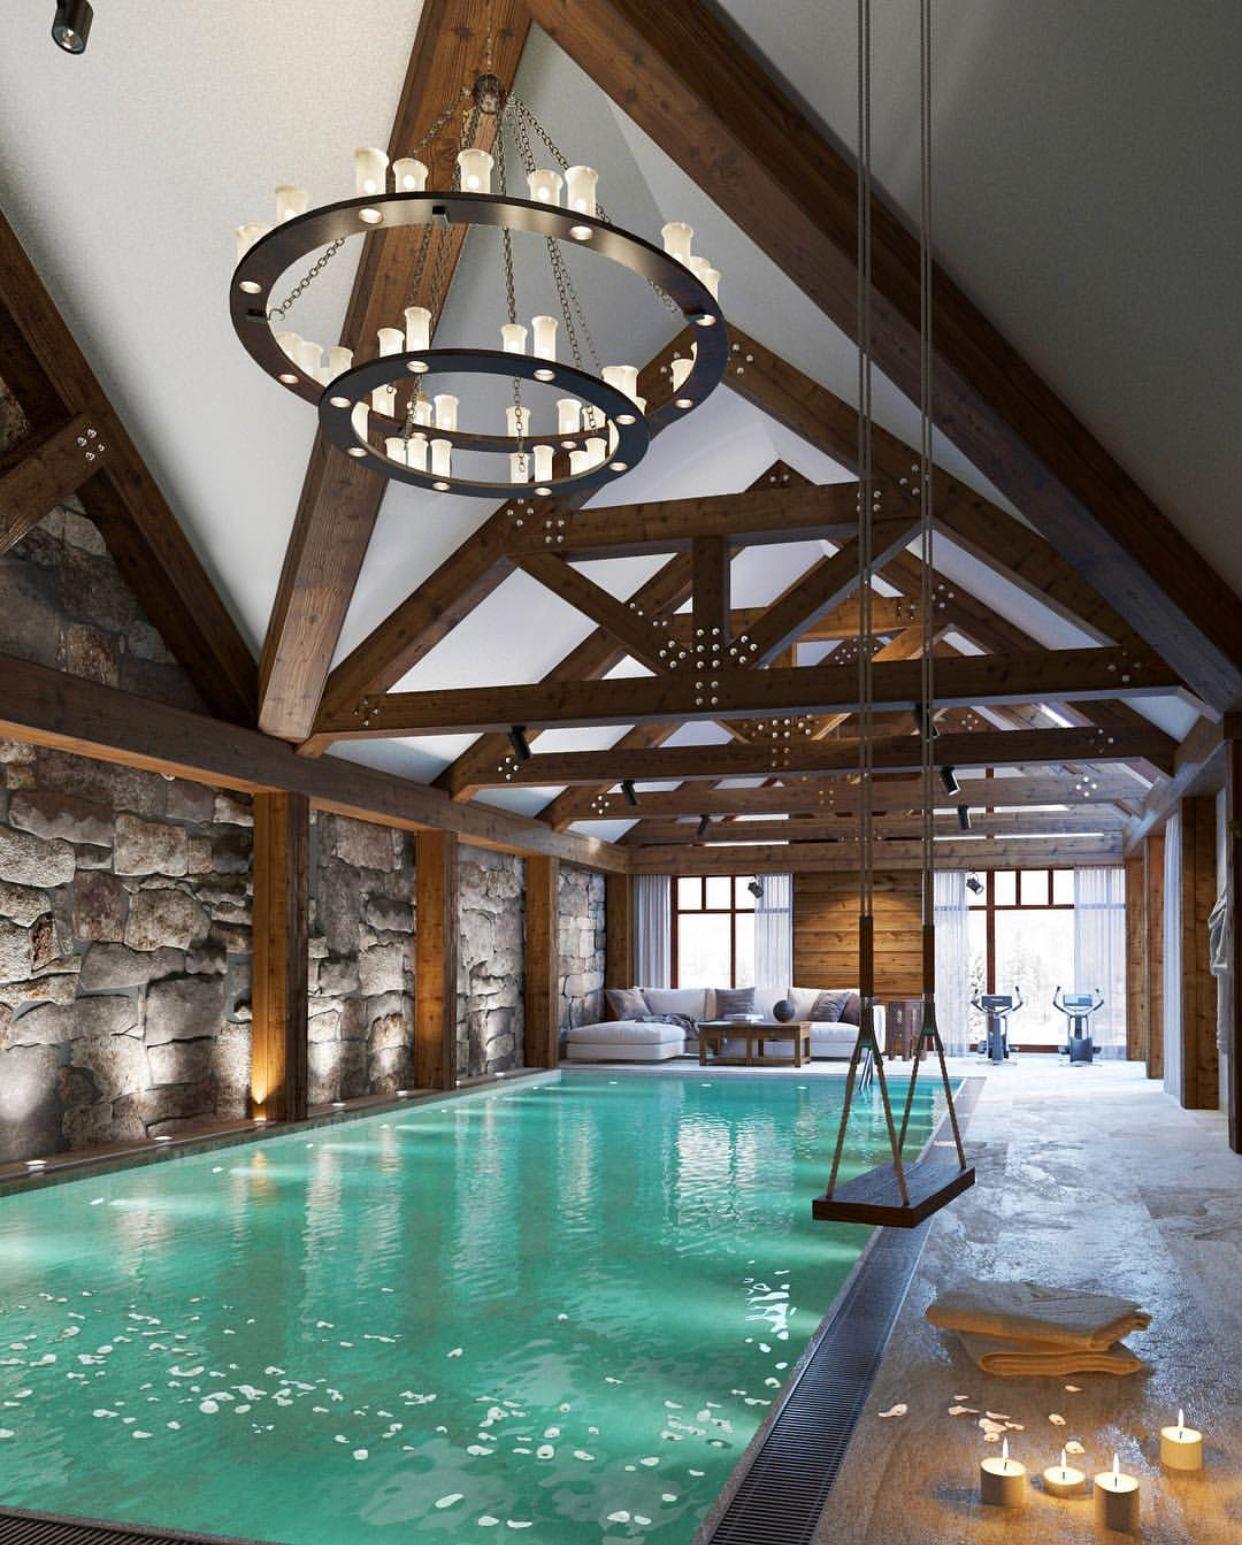 Indoor Swimming Pool At Its Best Indoor Pool Design Indoor Swimming Pool Design Pool Houses